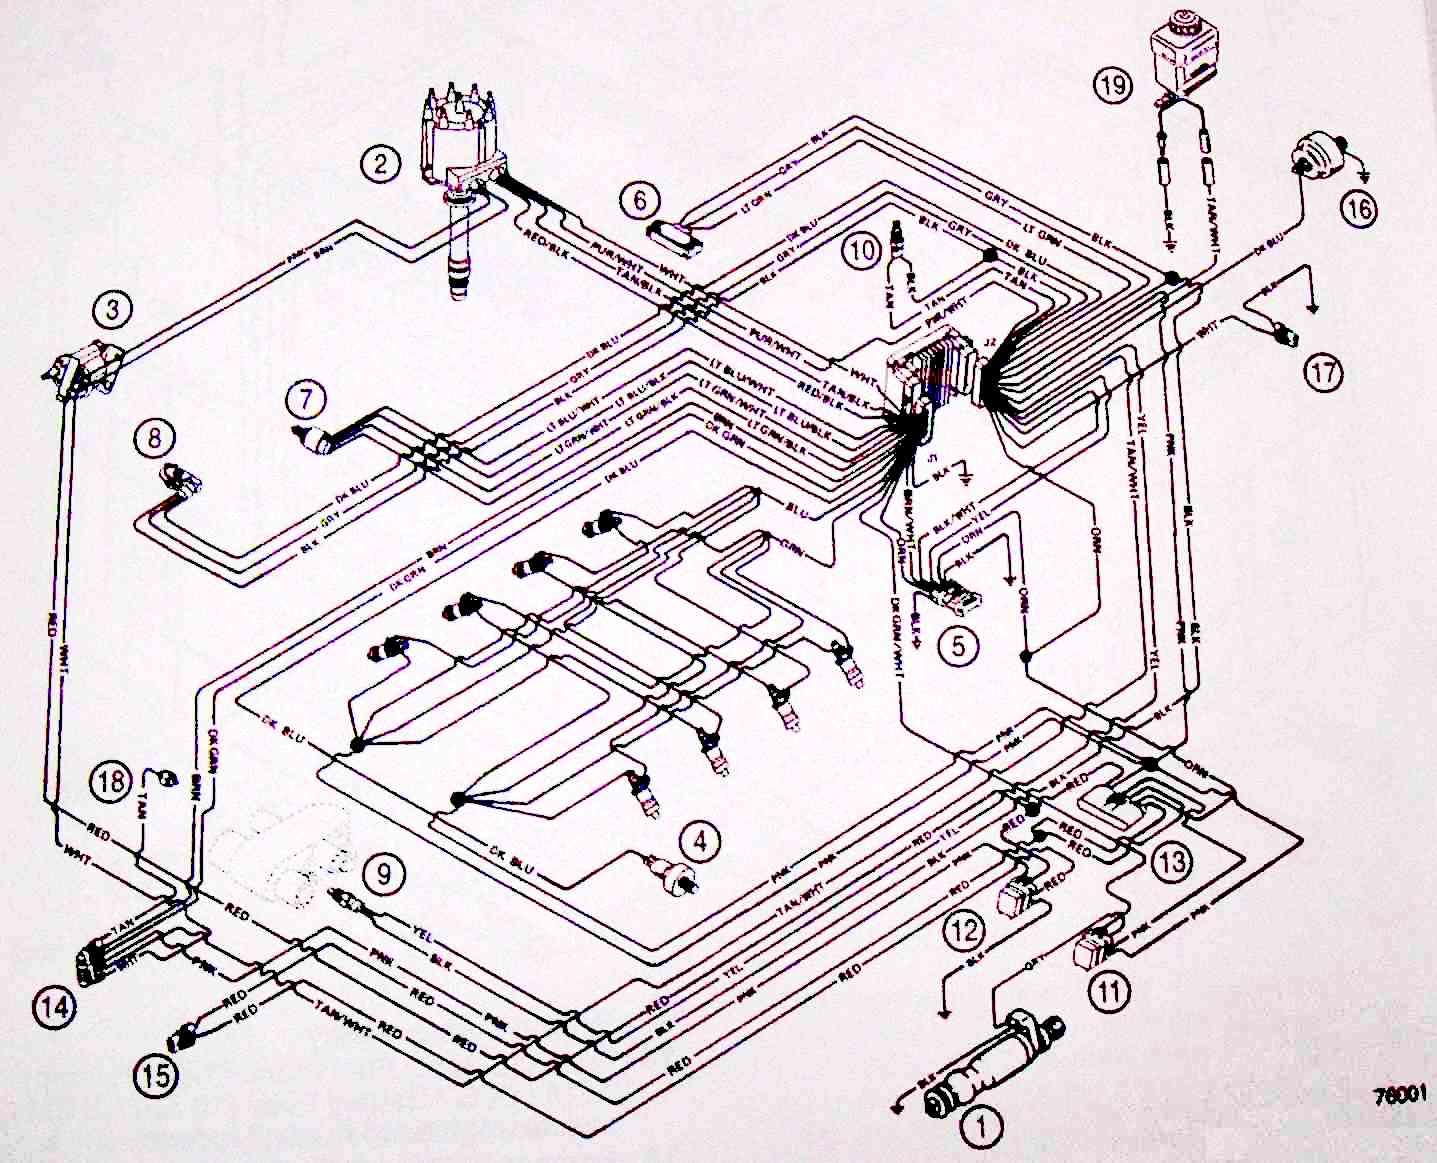 hight resolution of  mercruiser mercruiser 5 7 wiring diagram wiring diagram on basic ignition system diagram mercruiser alpha